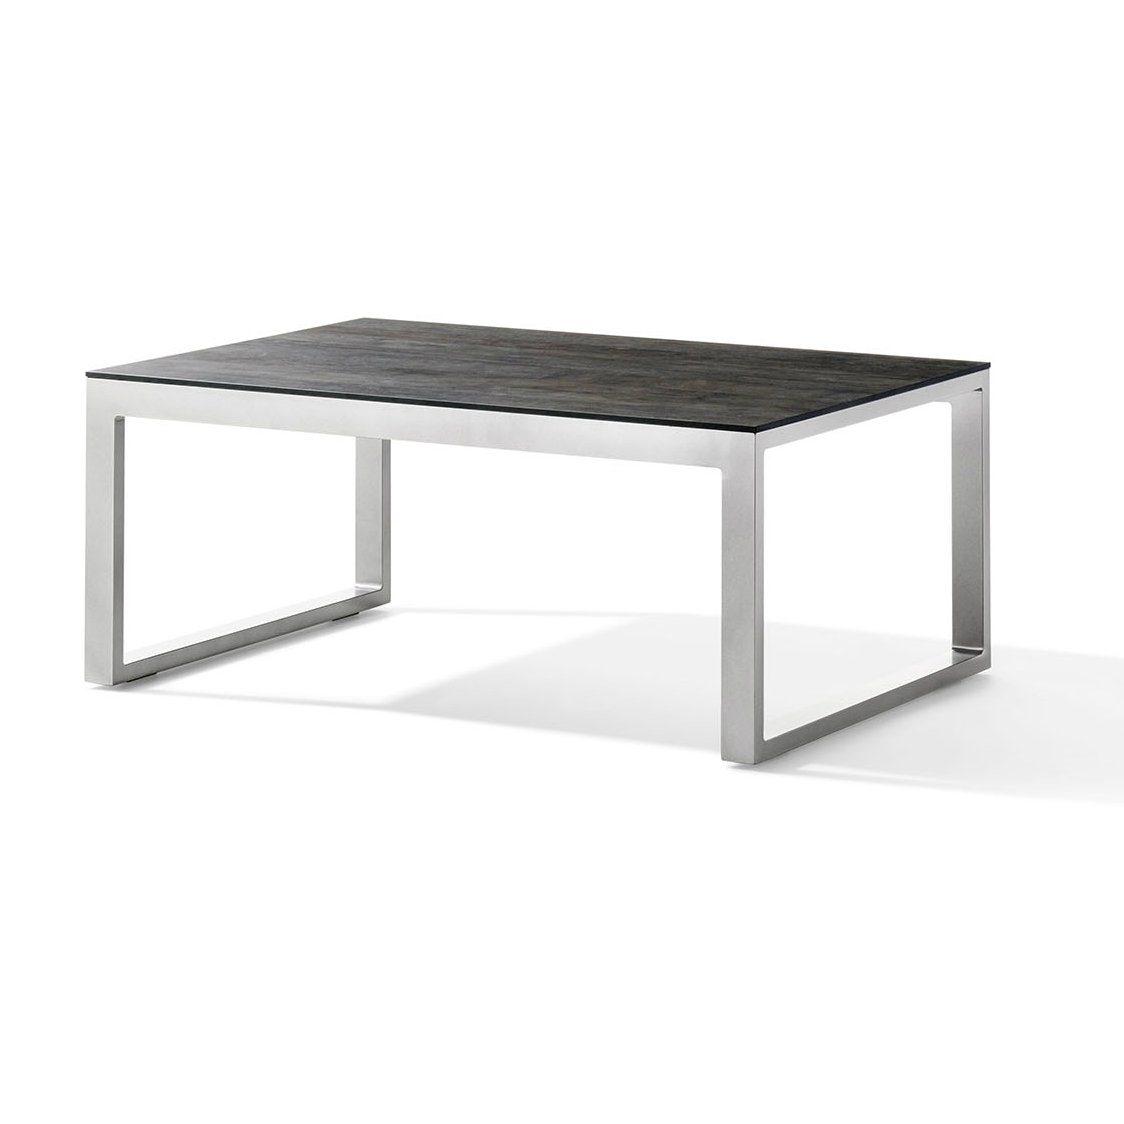 lounge tisch h henverstellbar ue07 kyushucon. Black Bedroom Furniture Sets. Home Design Ideas